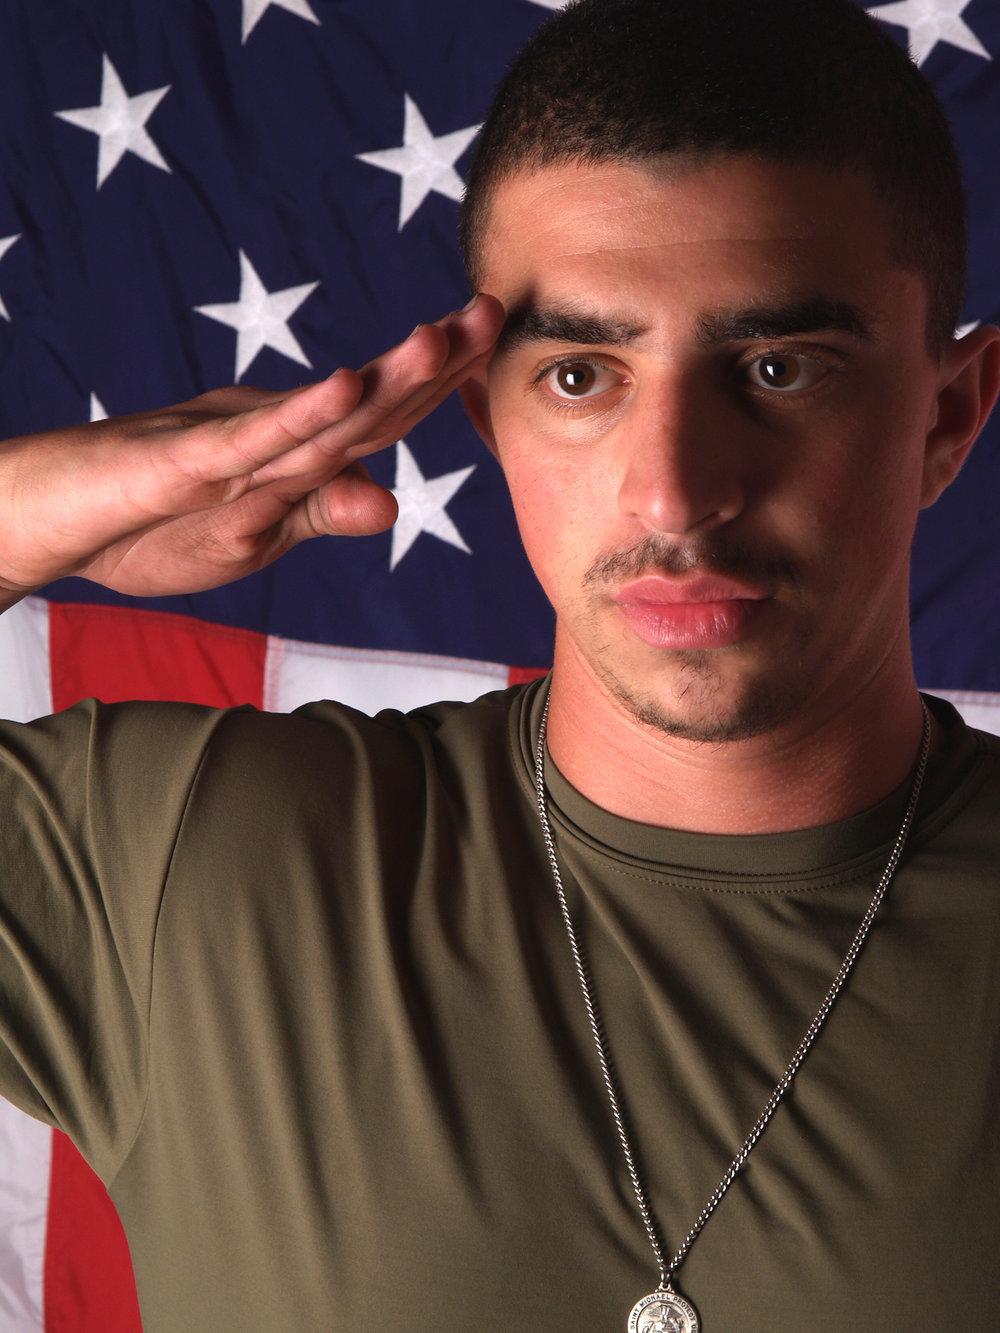 burgess marines.jpg